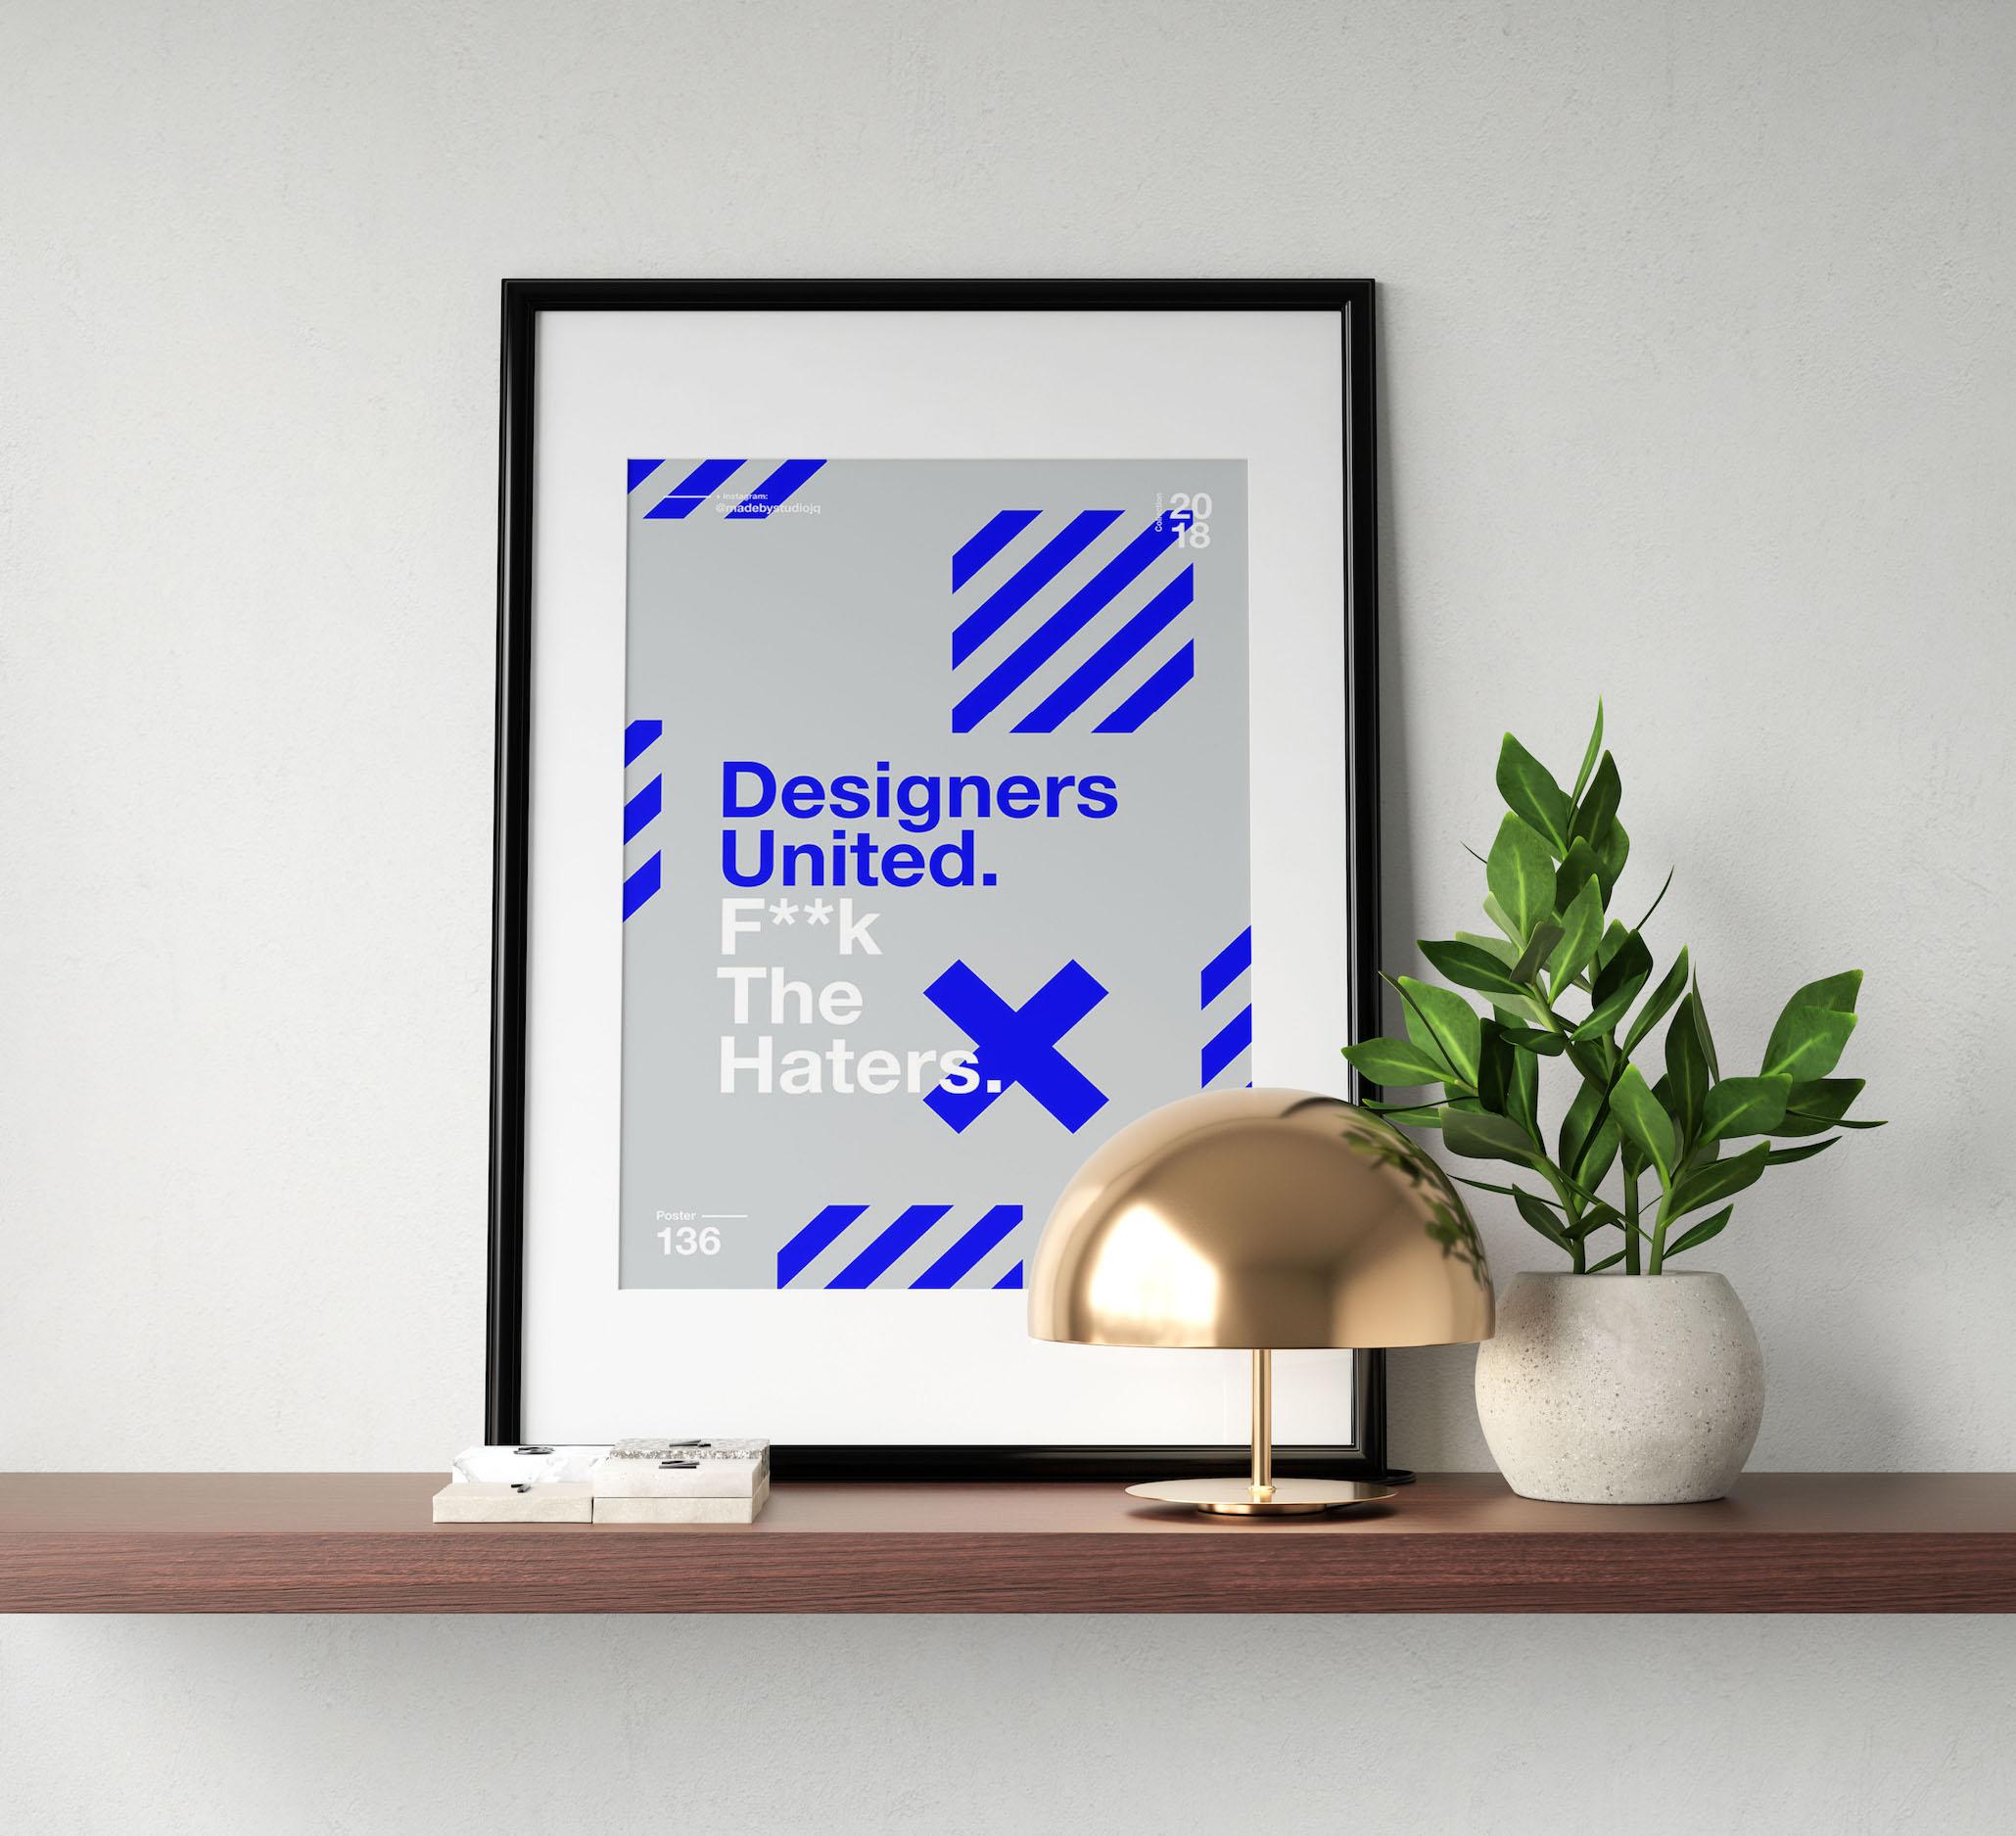 Blue & Gray Designers United Minimalist Poster Example ...